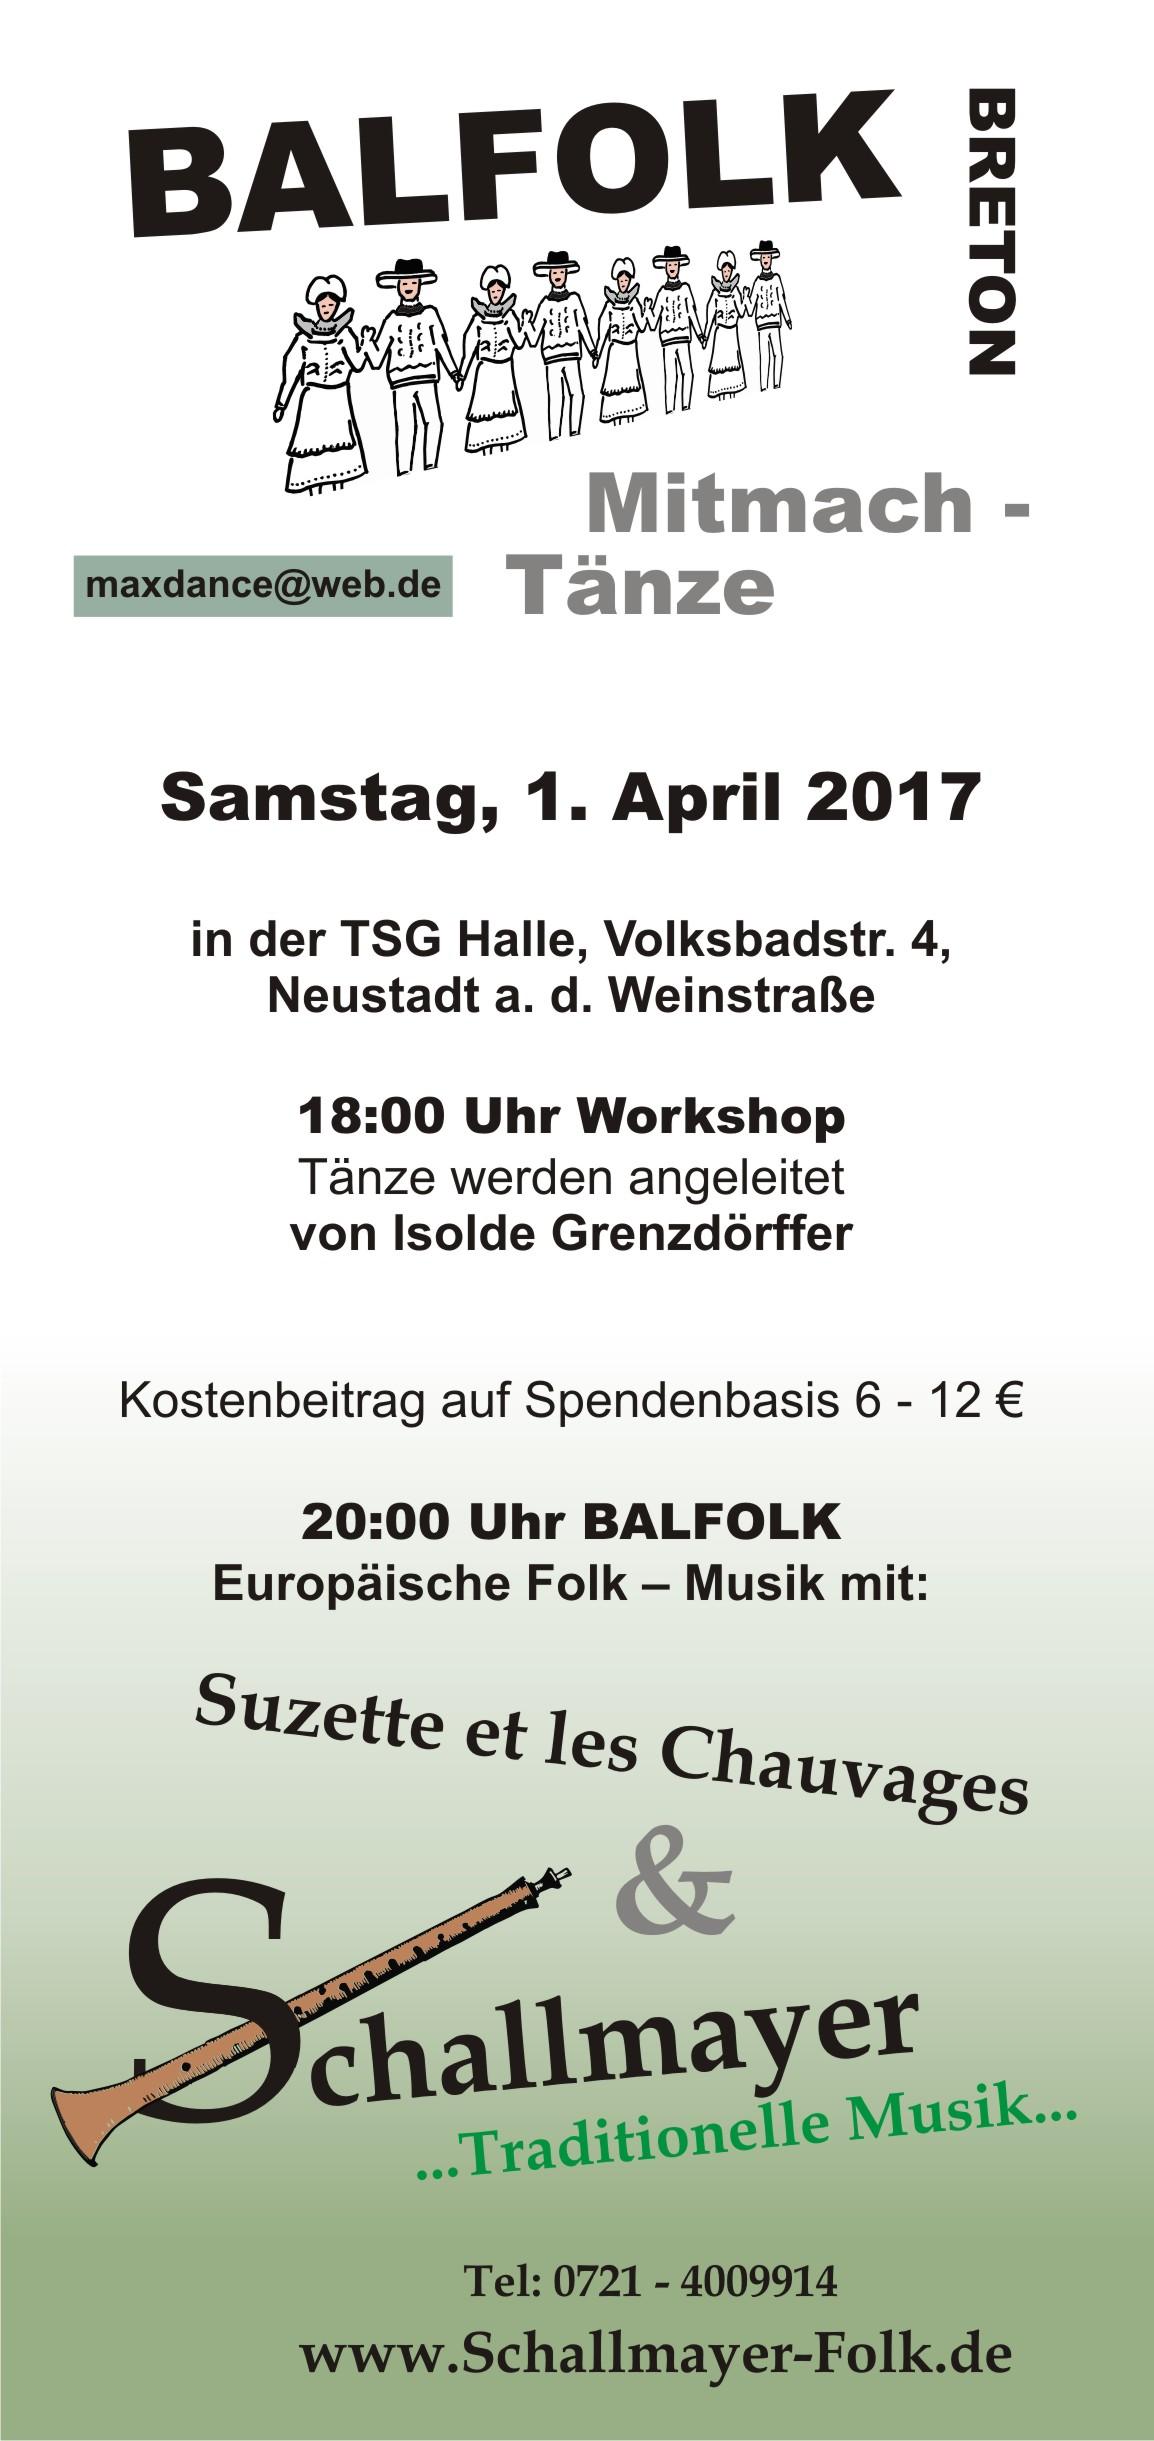 Schallmayer Balfolk Neustadt 1er-V00def